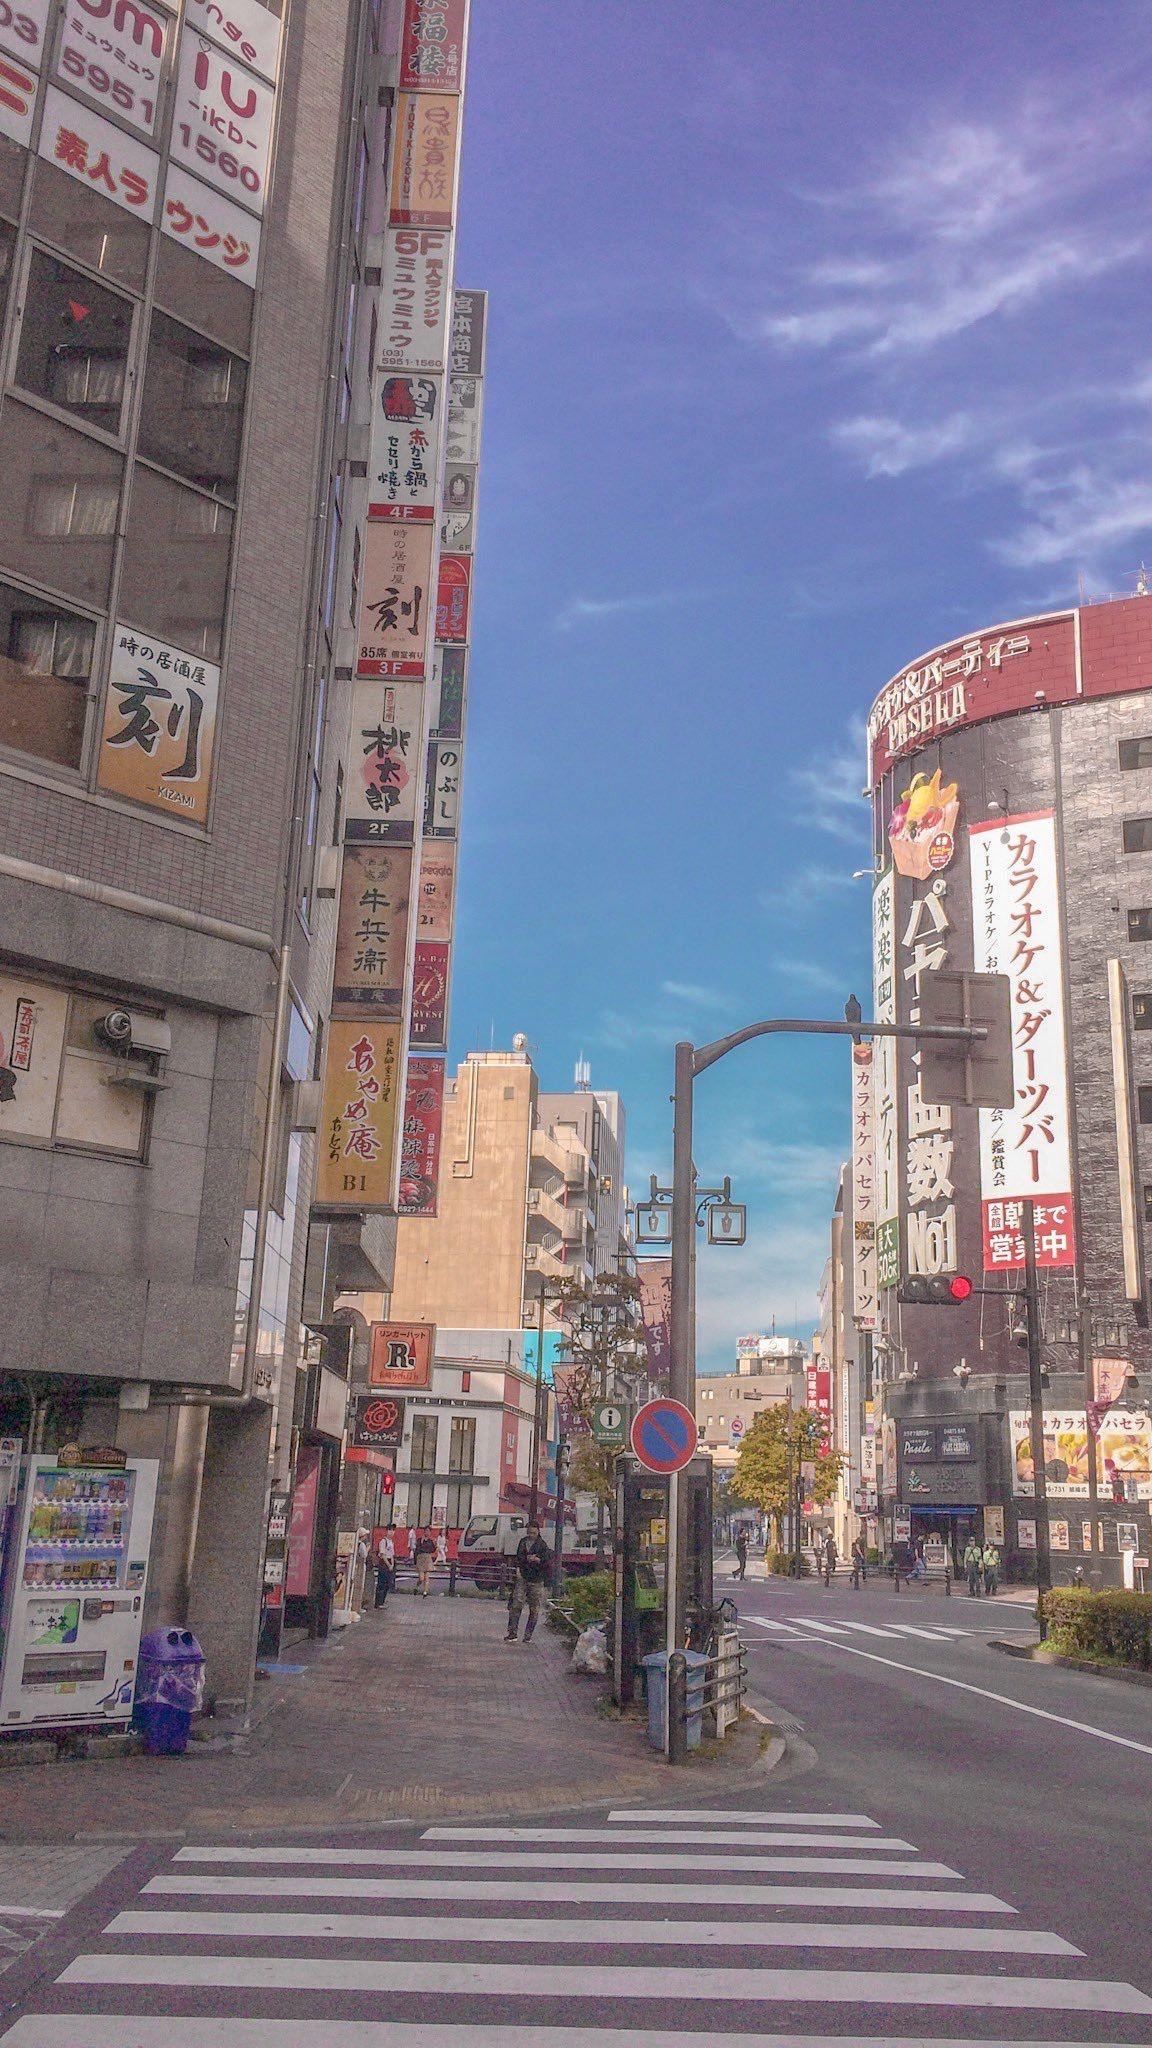 Pin Oleh Surya Lestari Di Story Latar Belakang Pemandangan Kota Wisata Jepang